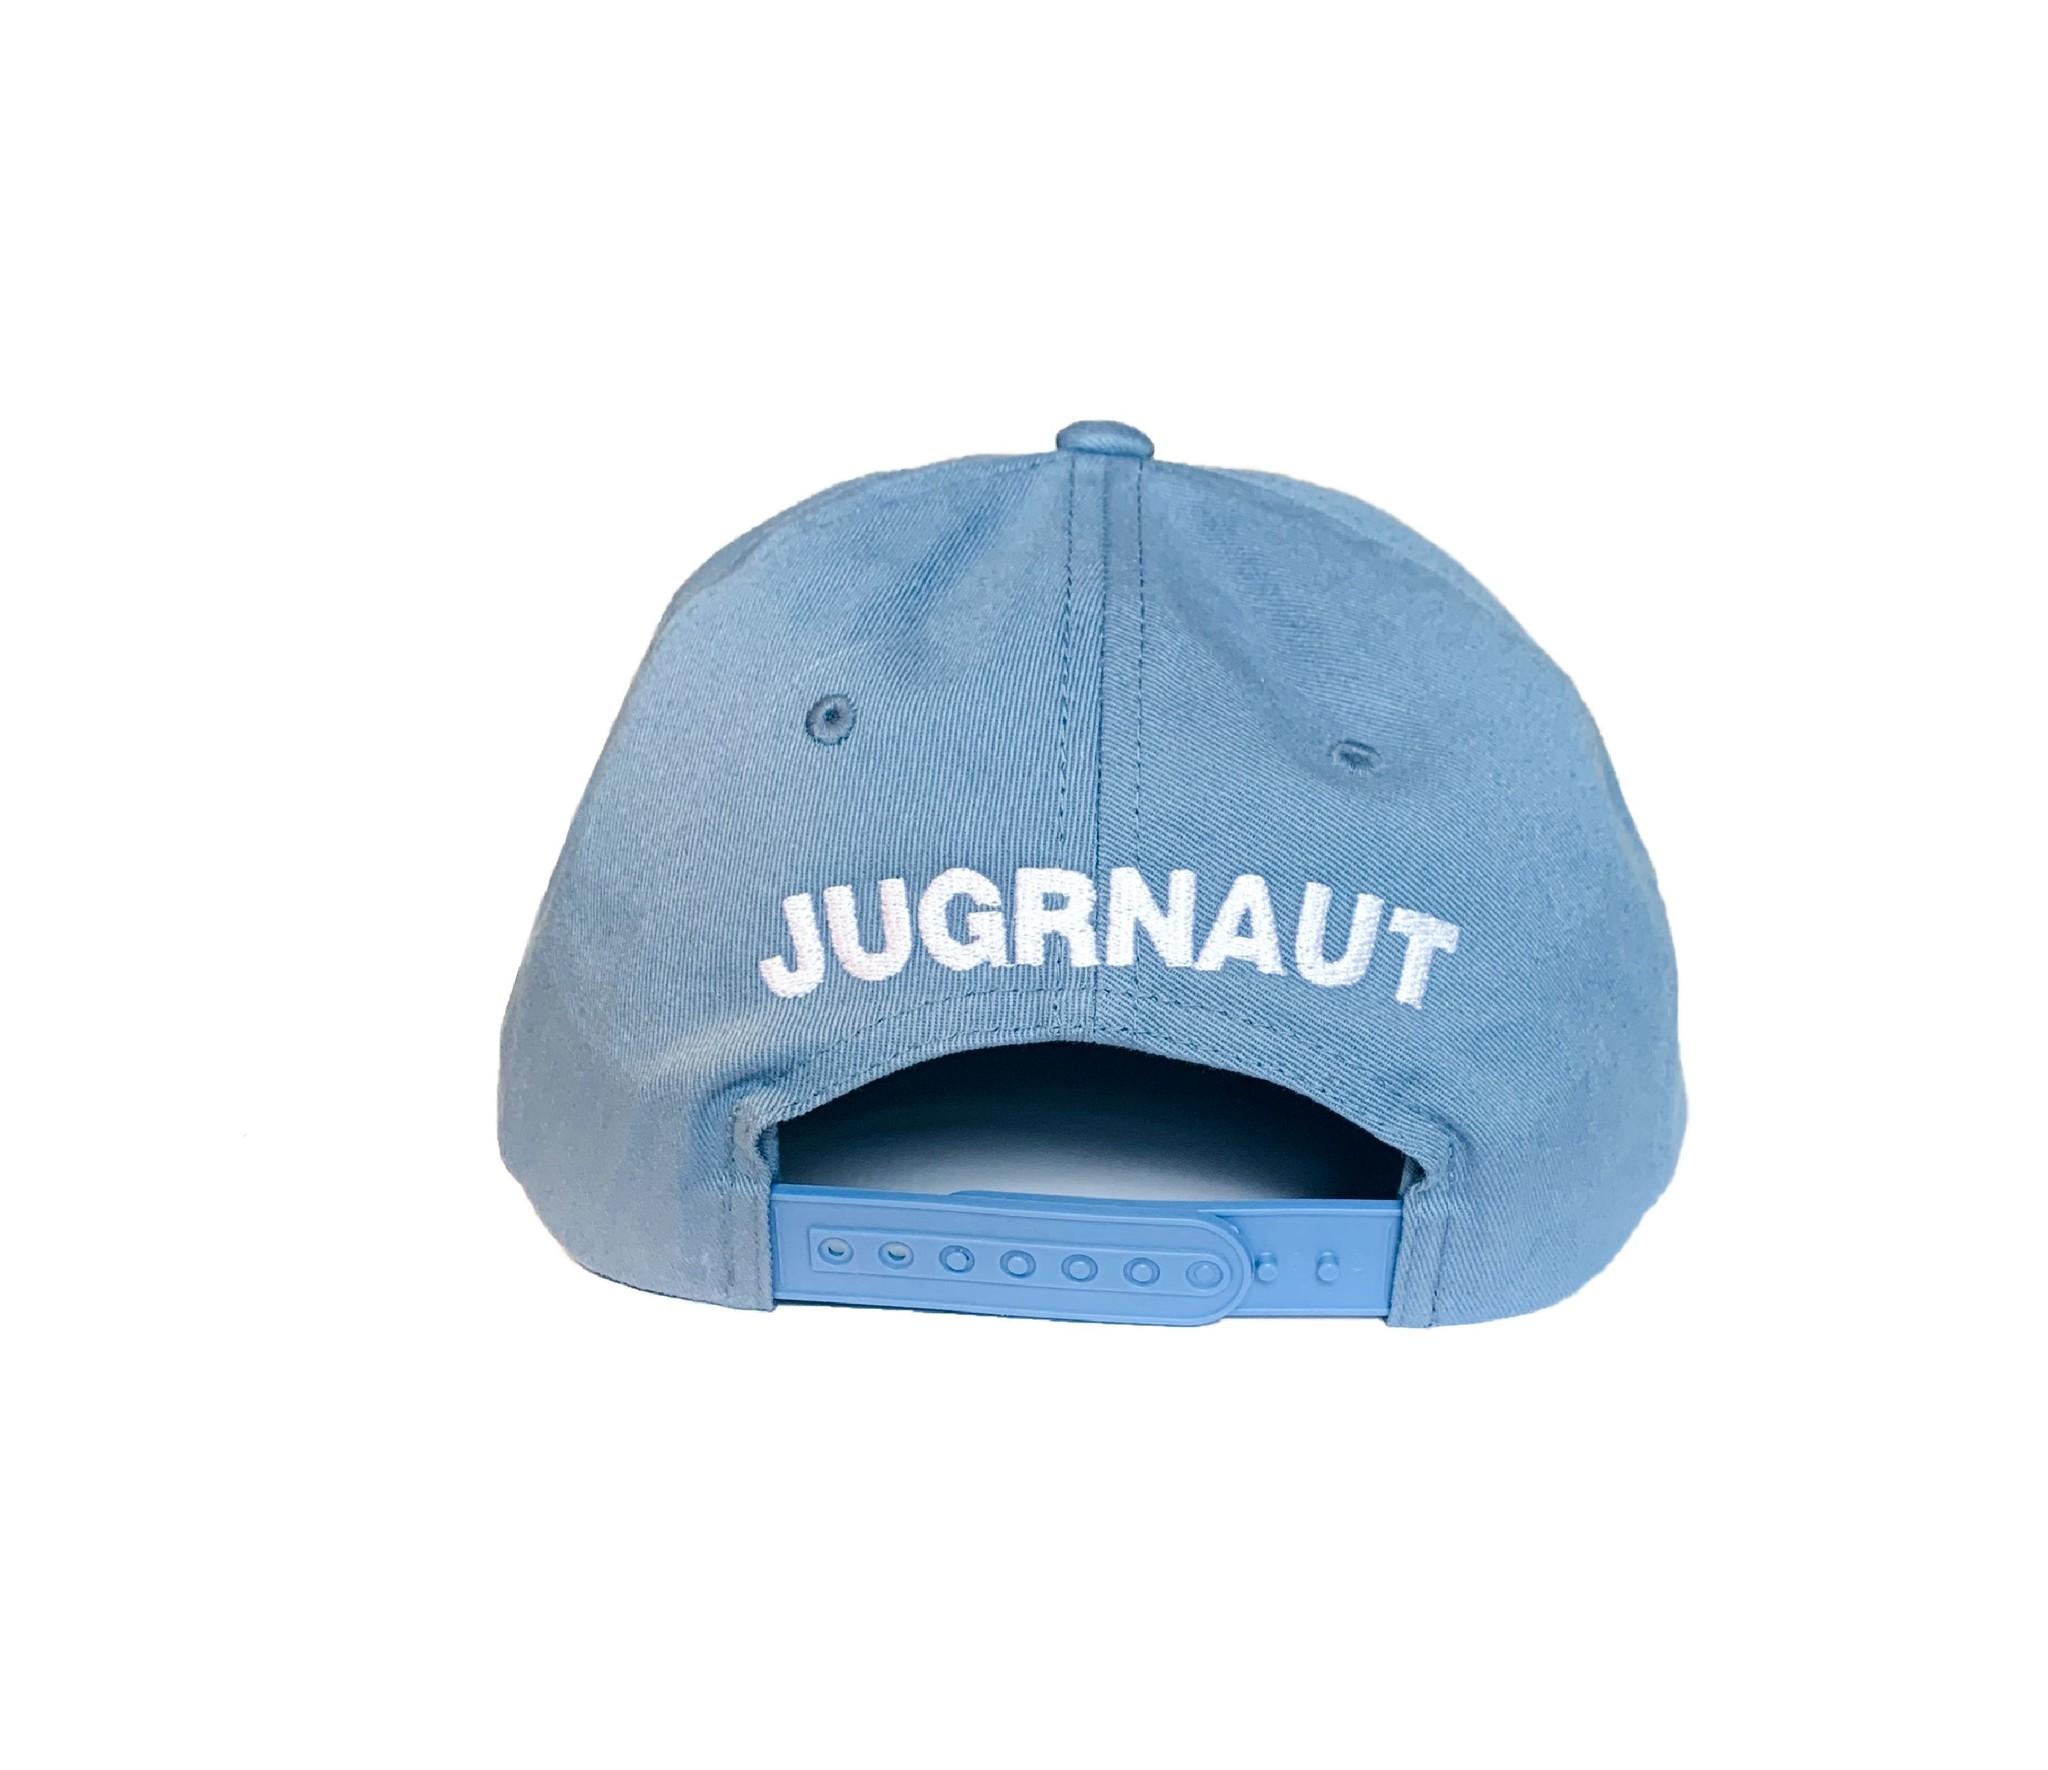 Jugrnaut Jugrnaut Shield Cap Light Blue